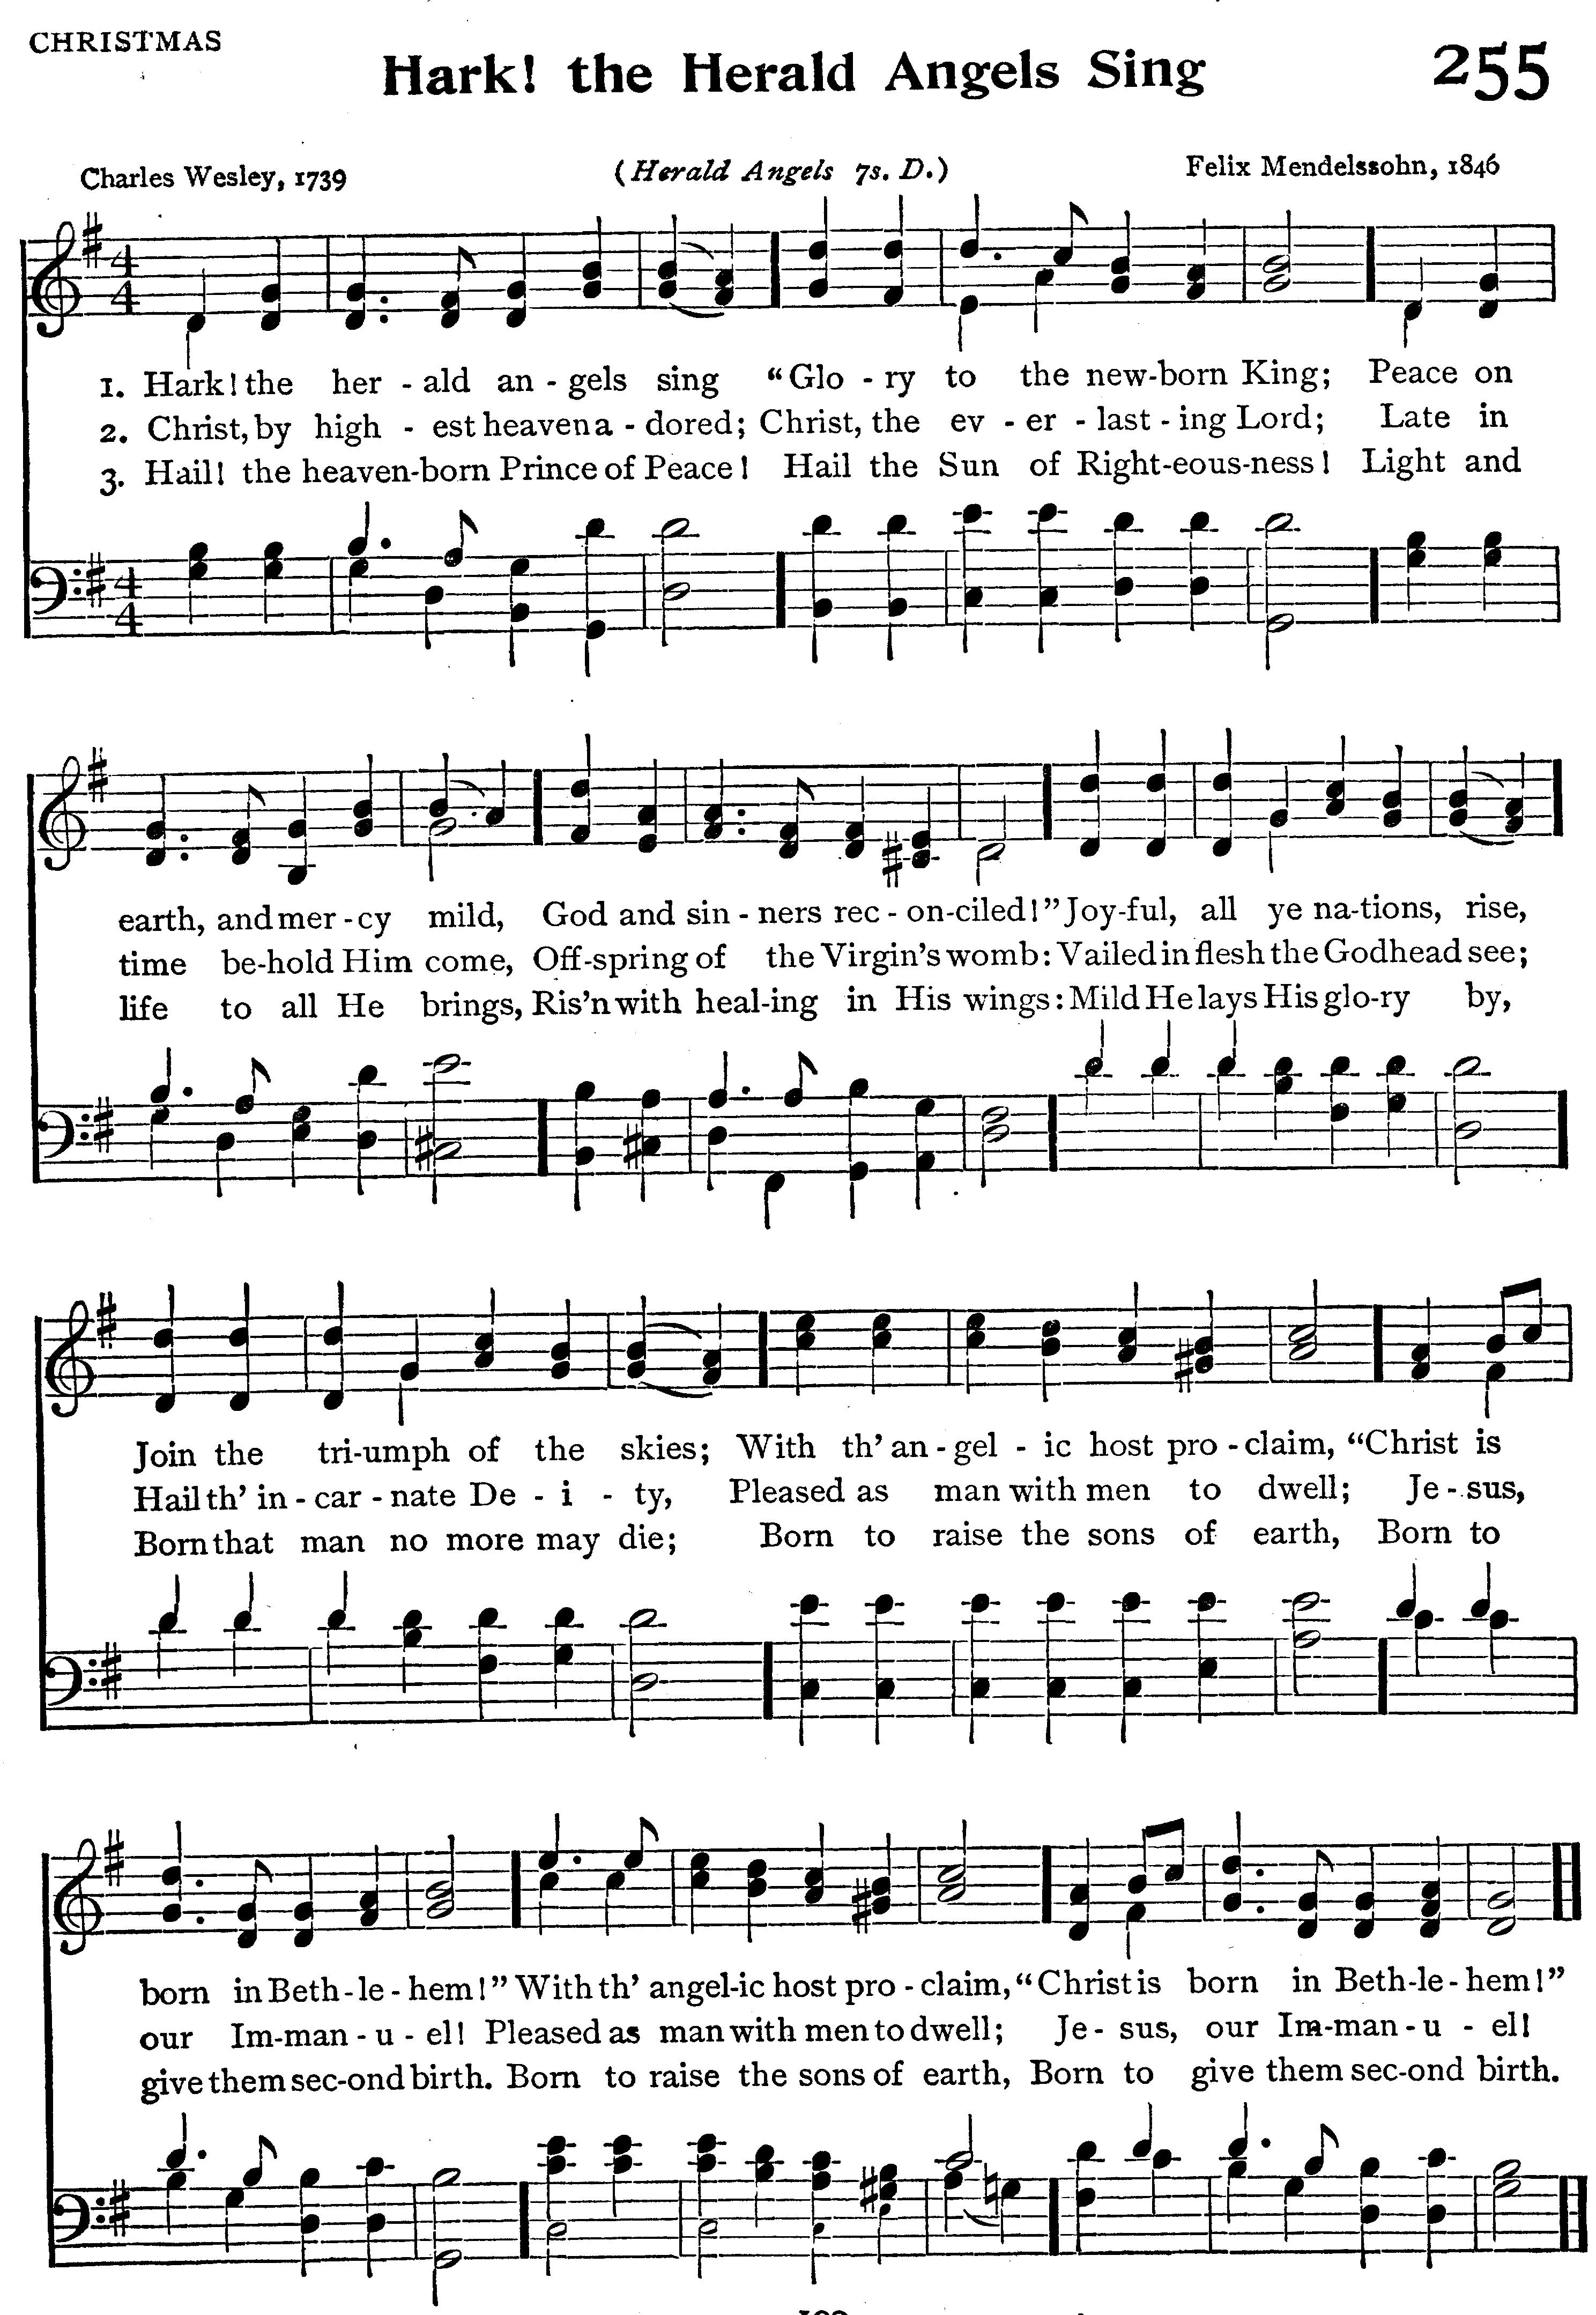 Hark the herald angels sing | Hark! The Herald Angels Sing | Making ...